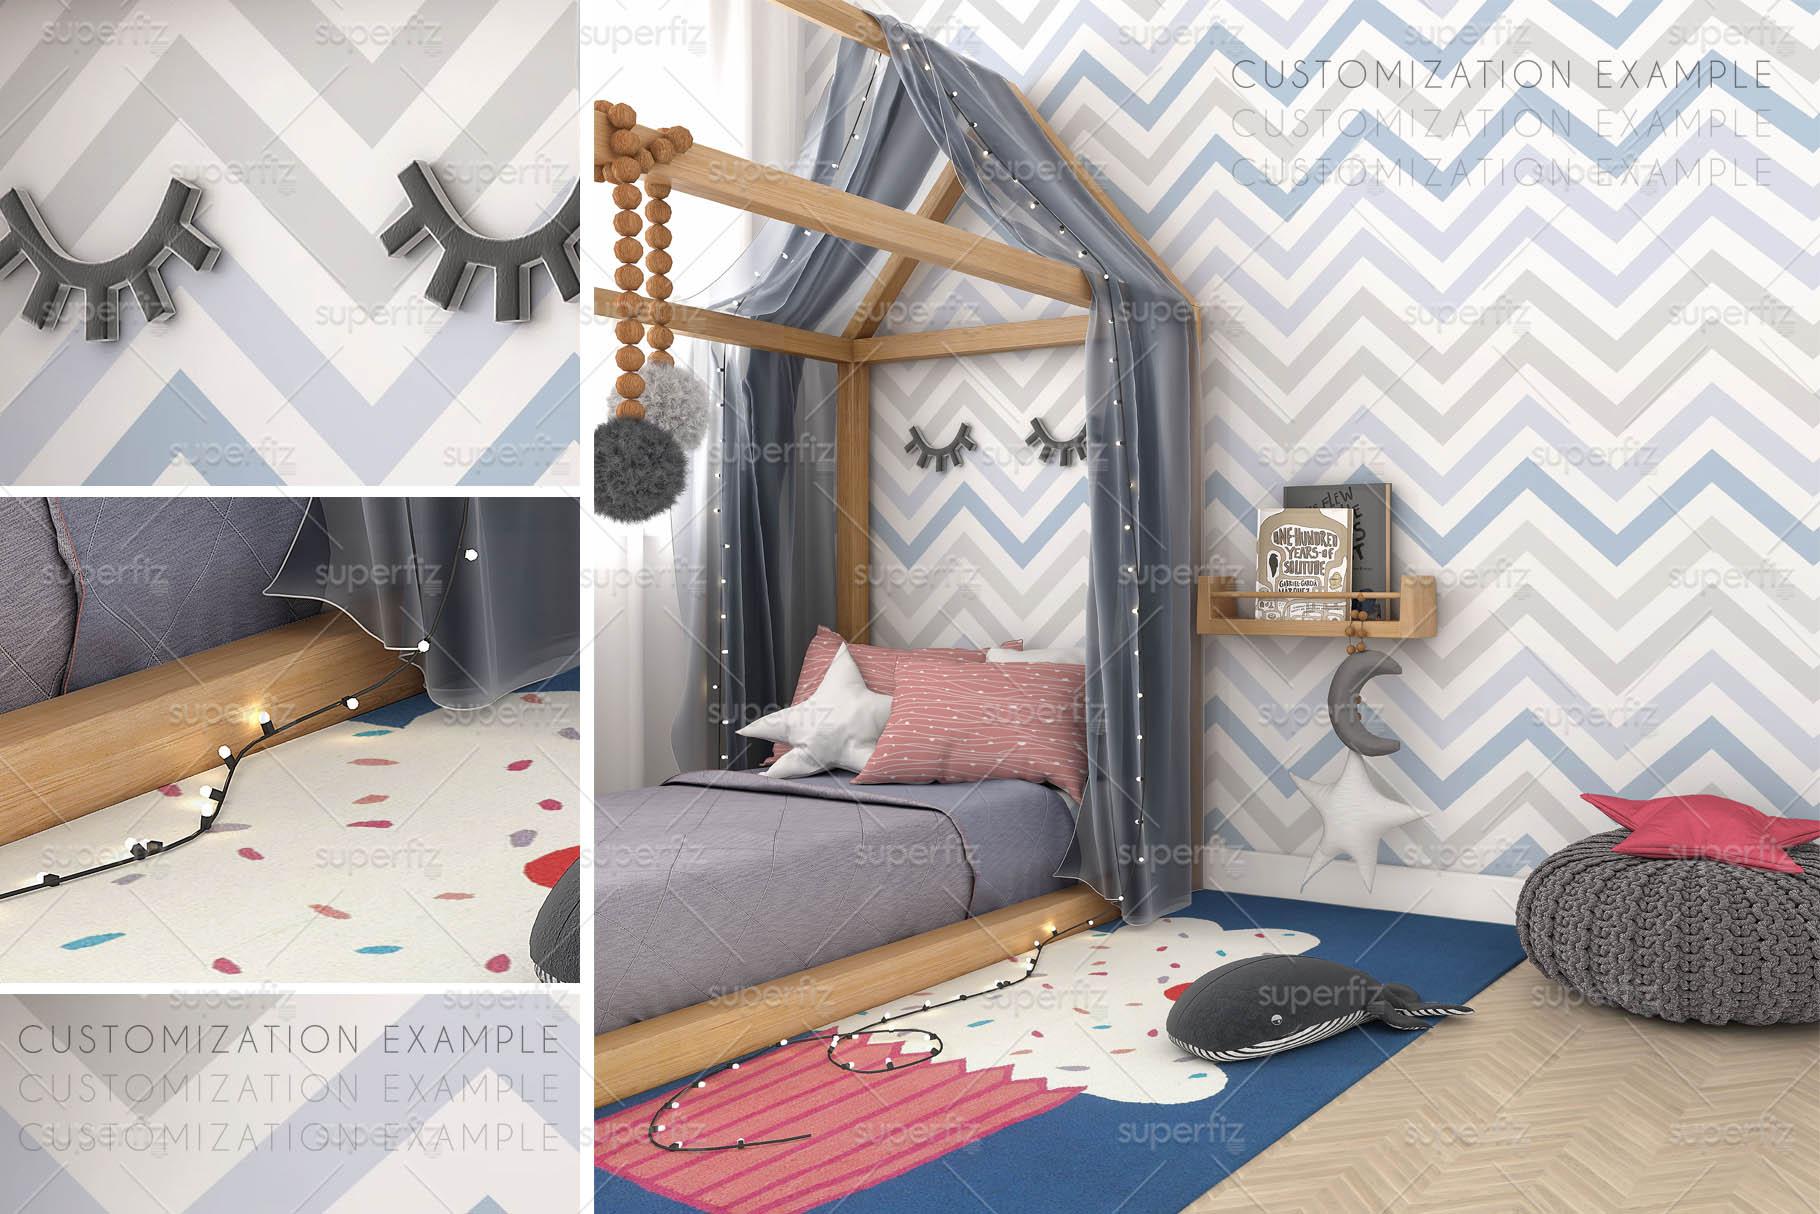 Wallpaper Mockup Kids Bedroom SM59 example image 5